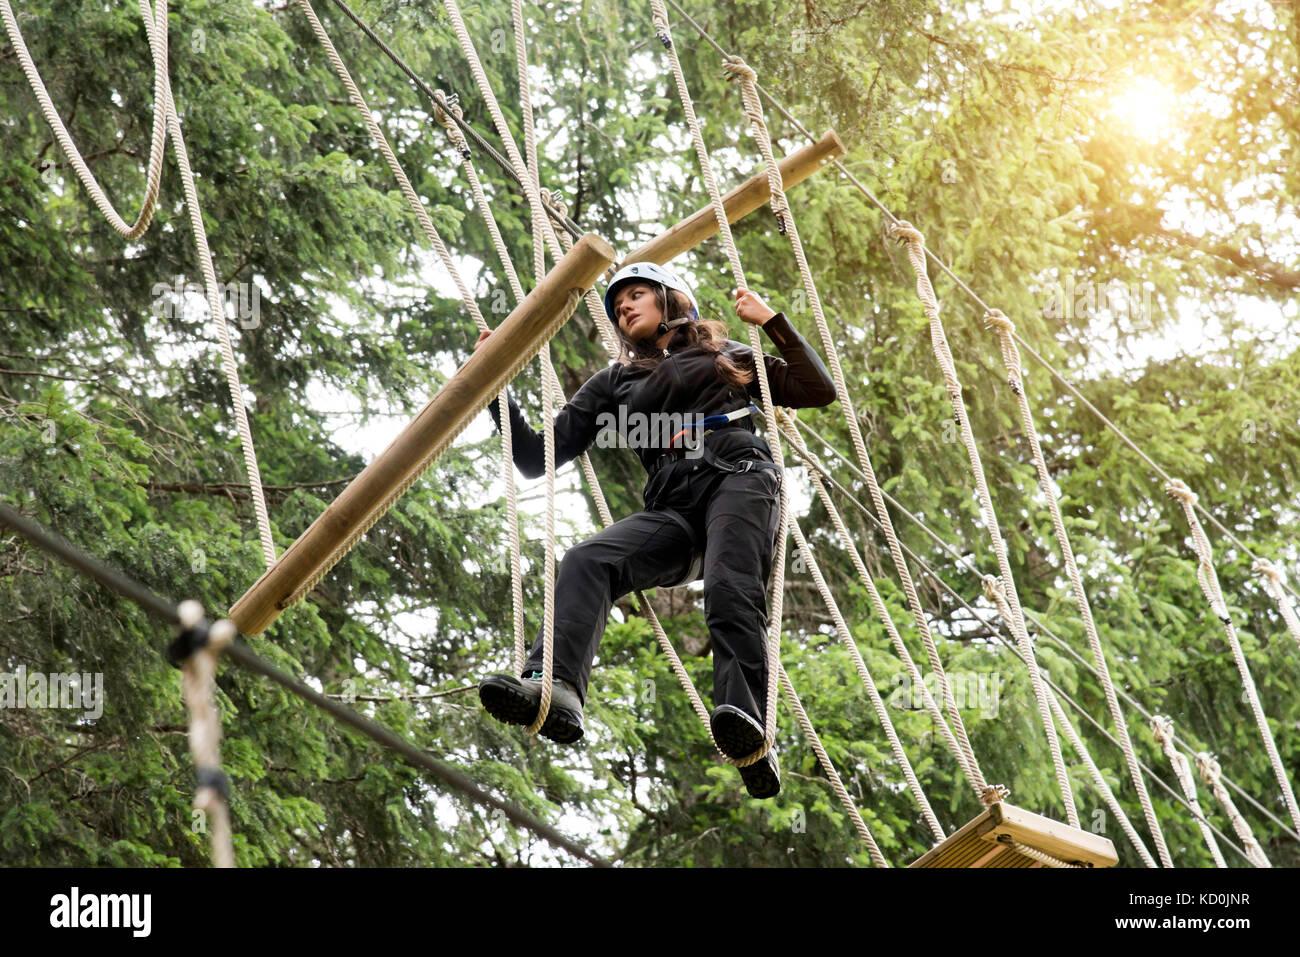 Teenage girl on high rope course - Stock Image